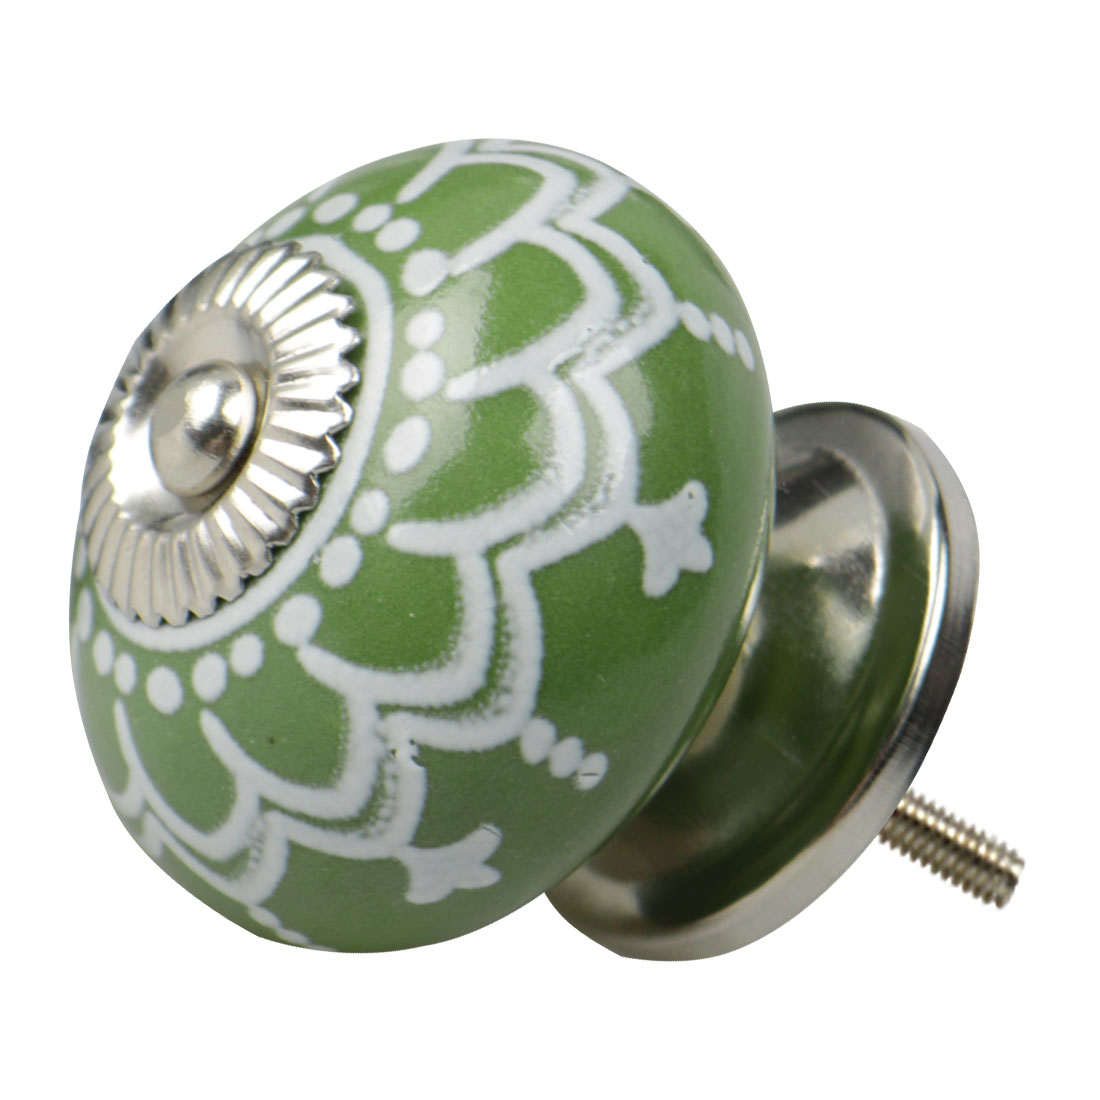 Ceramic Vintage Knob Drawers Round Pull Handle Cabinet Wardrobe Door, Green